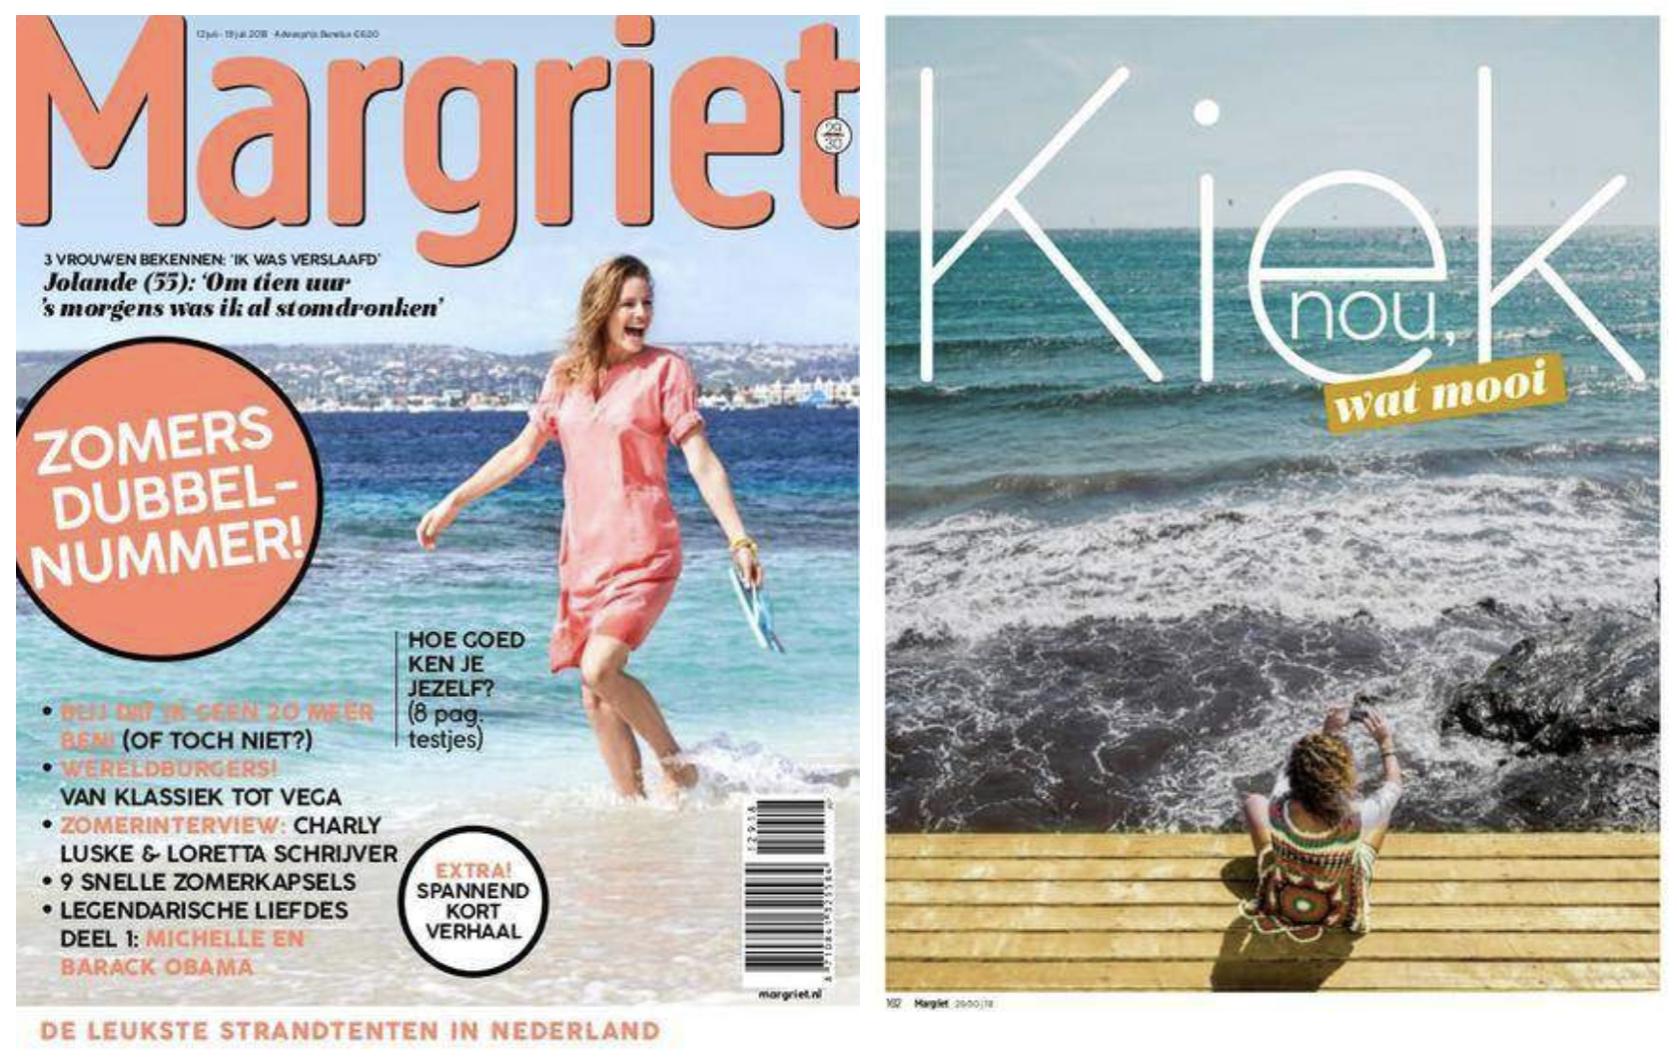 Margriet cover artikel interview fotografie Joost Bastmeijer.png